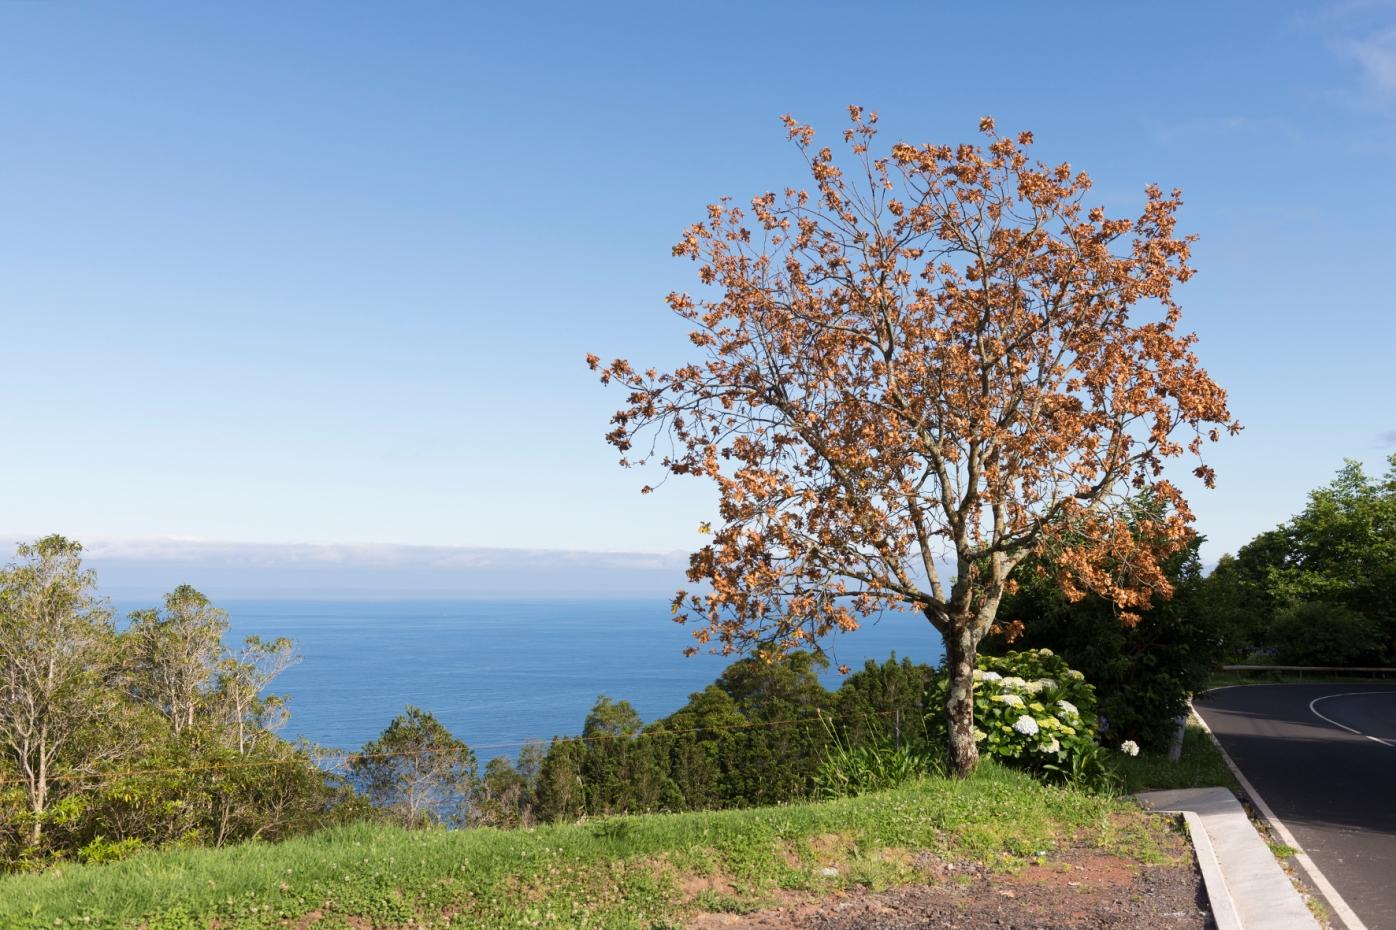 Au bord de la route, le sublime jardin de Ponta do Sossego surplombe la mer.